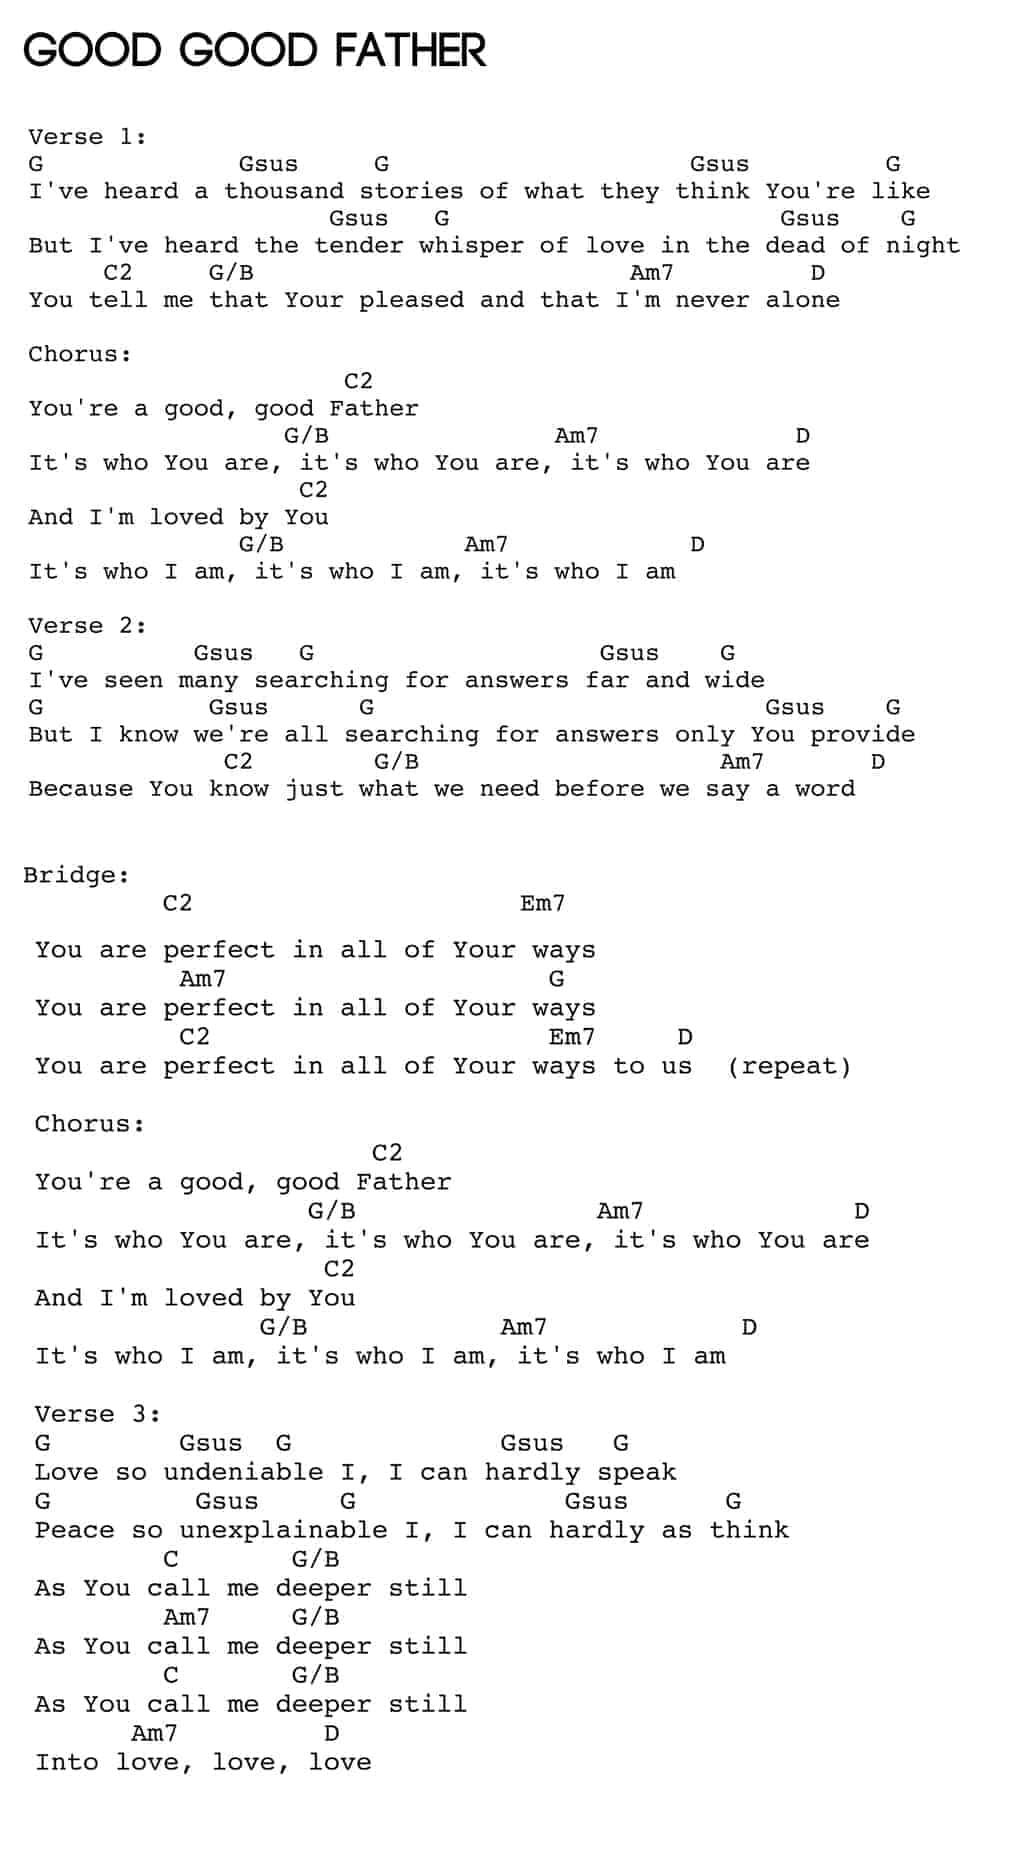 goodgoodfather-chords